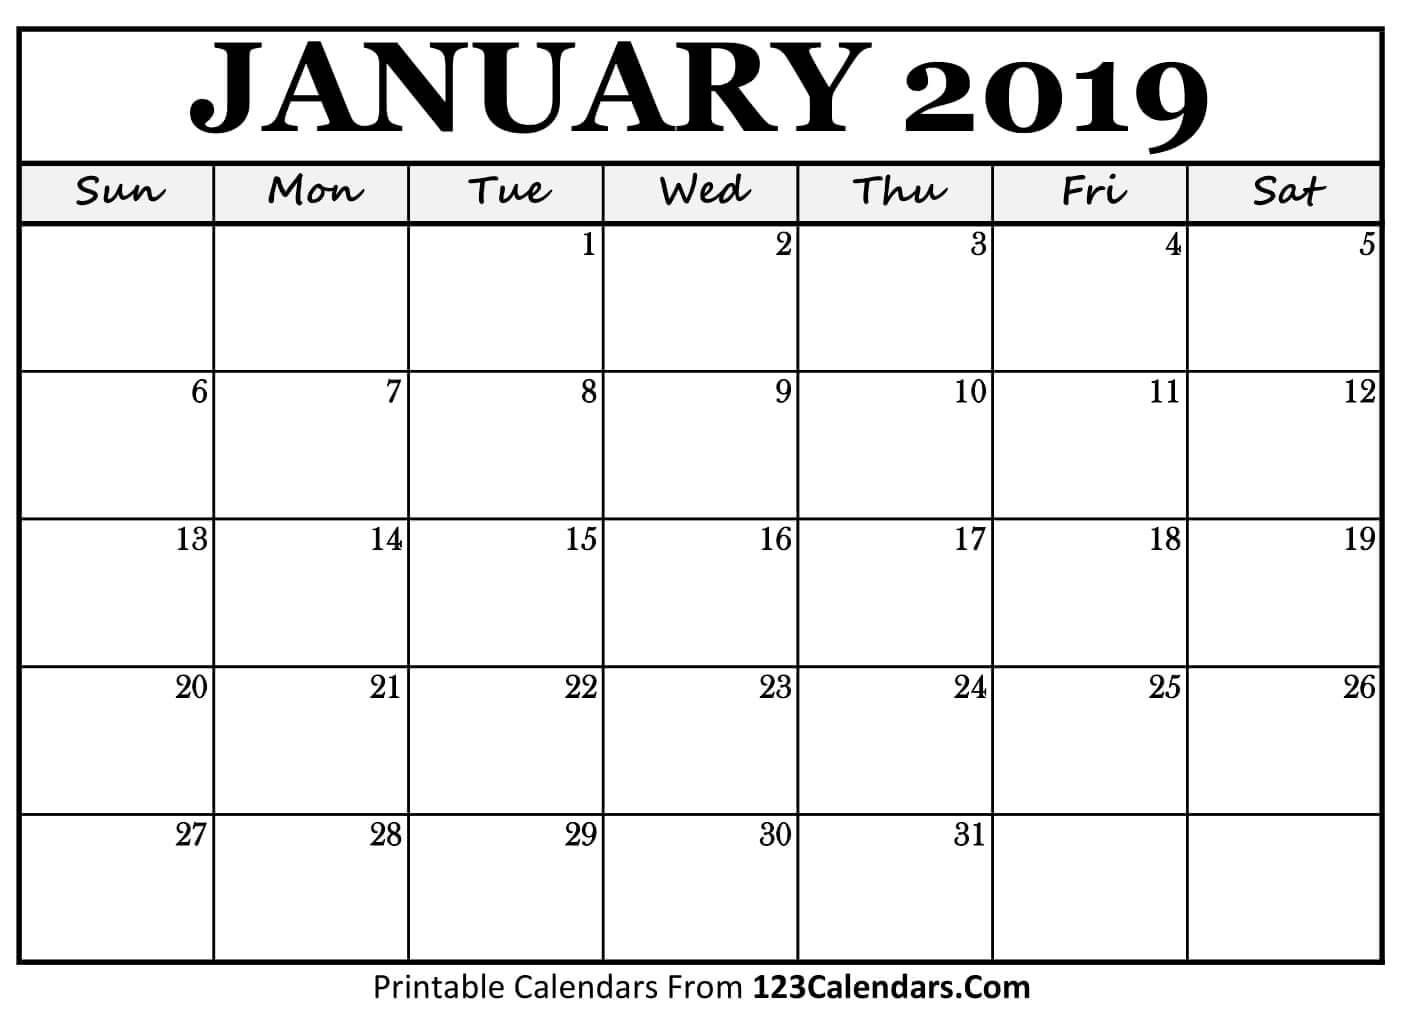 Calendar Free Printable 2019 2019 Printable Calendar 123calendars